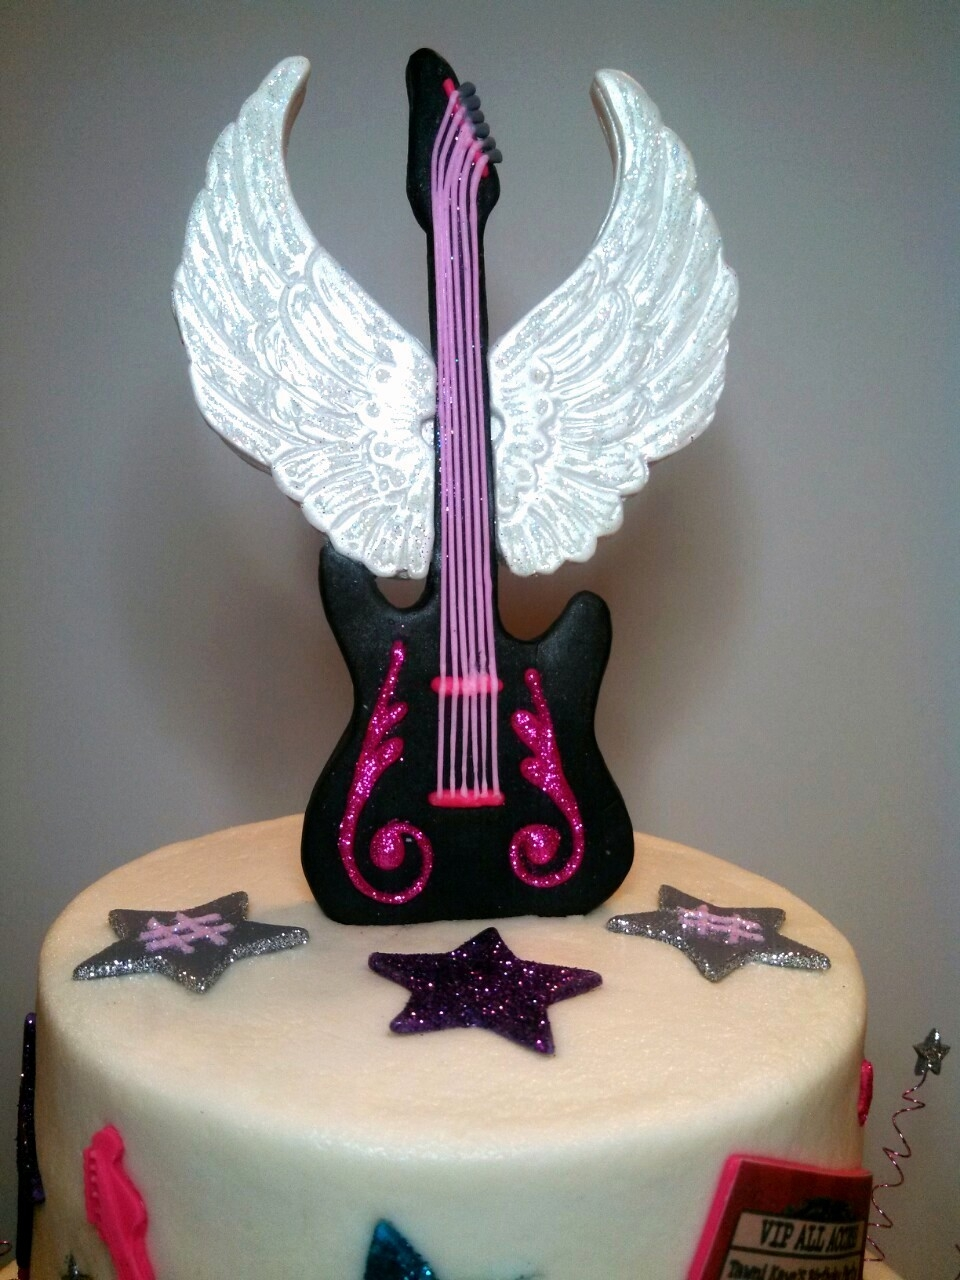 Rock Star Birthday Cake - CakeCentral.com